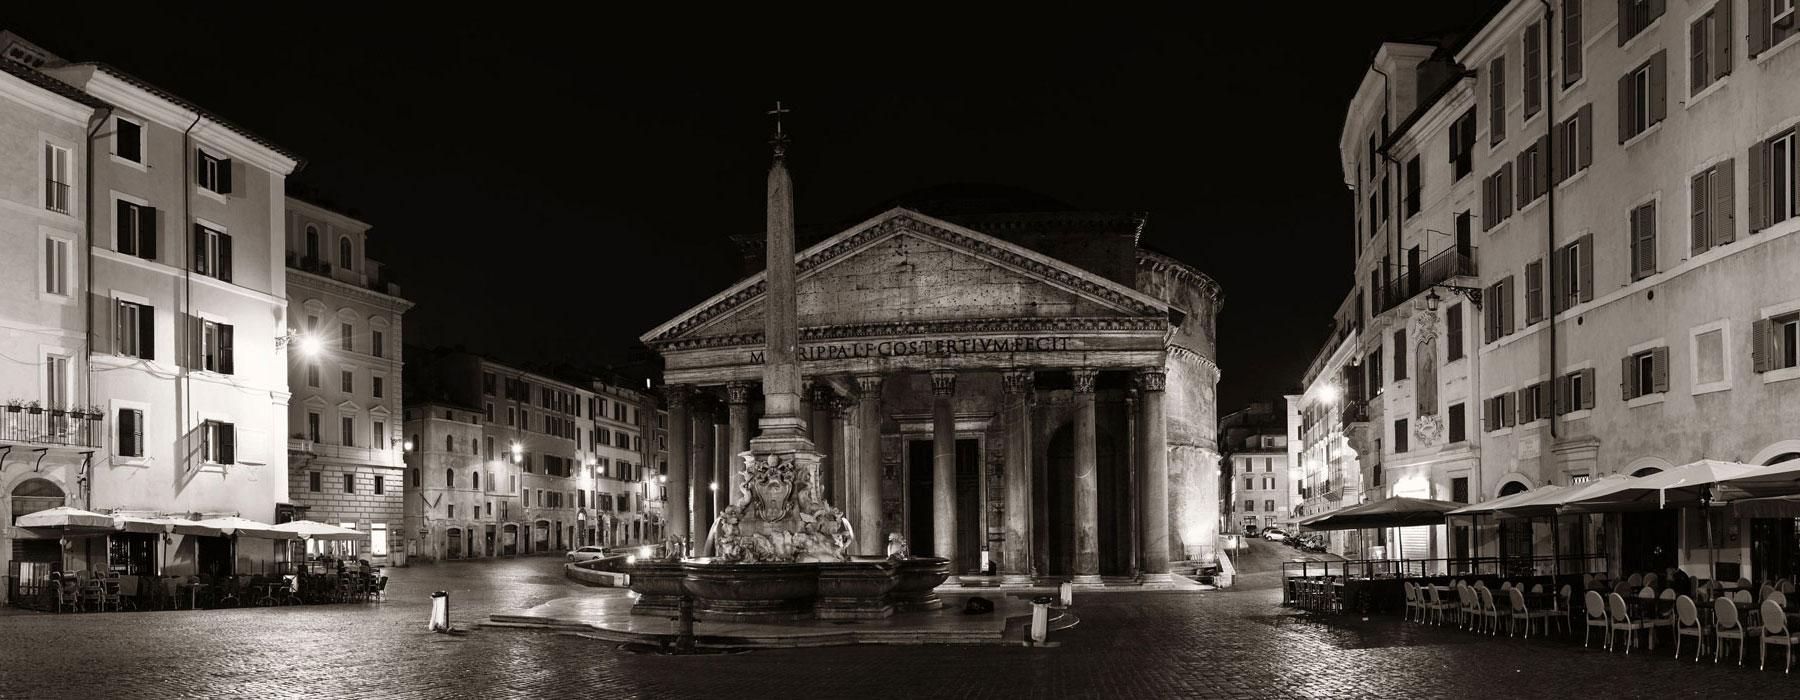 Roma_9.jpg